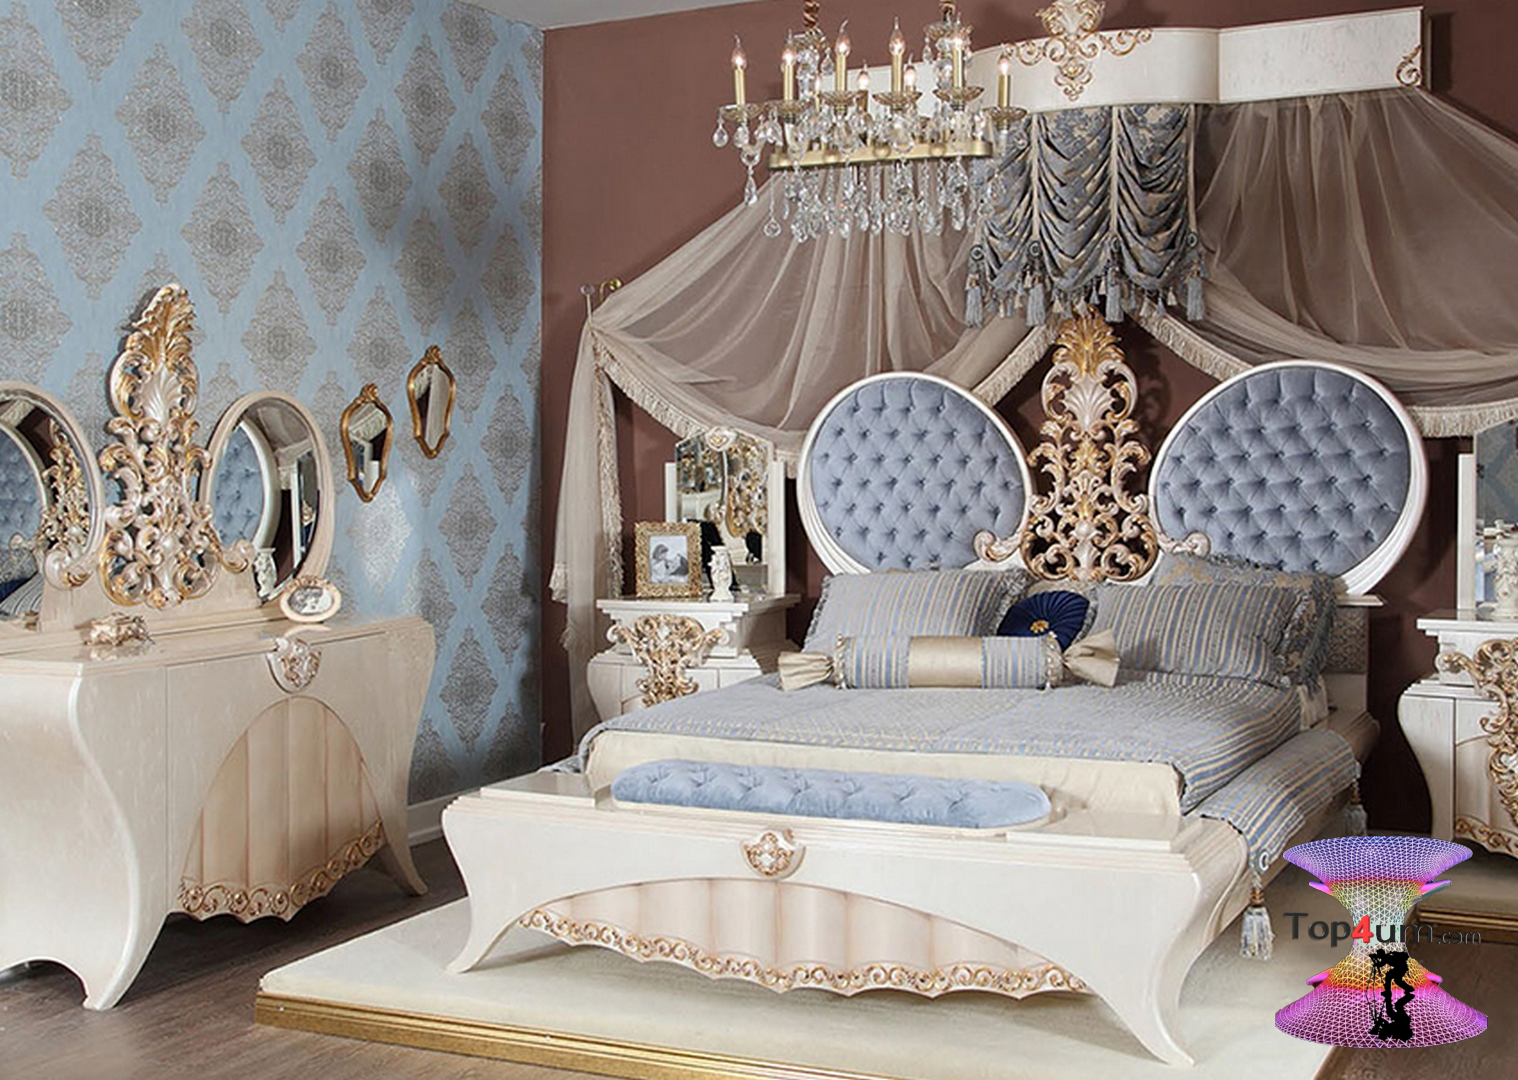 احلي مفارش سرير وسفرة 2020 مفرش عرايس تركي اروع مفارش للعروسة 1